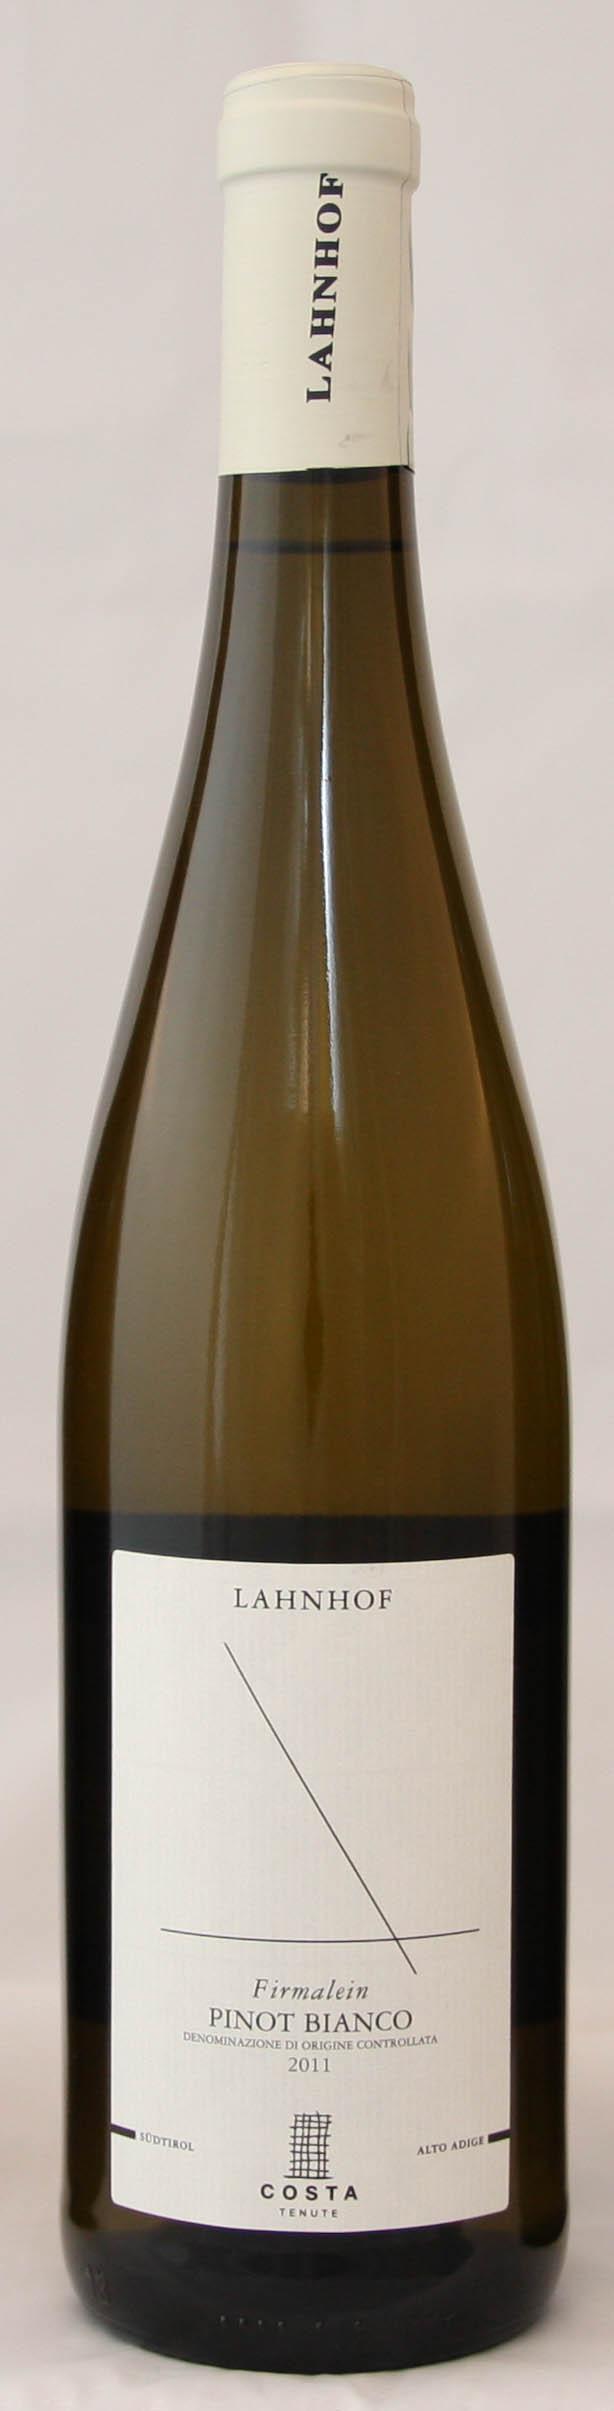 Pinot Bianco DOC